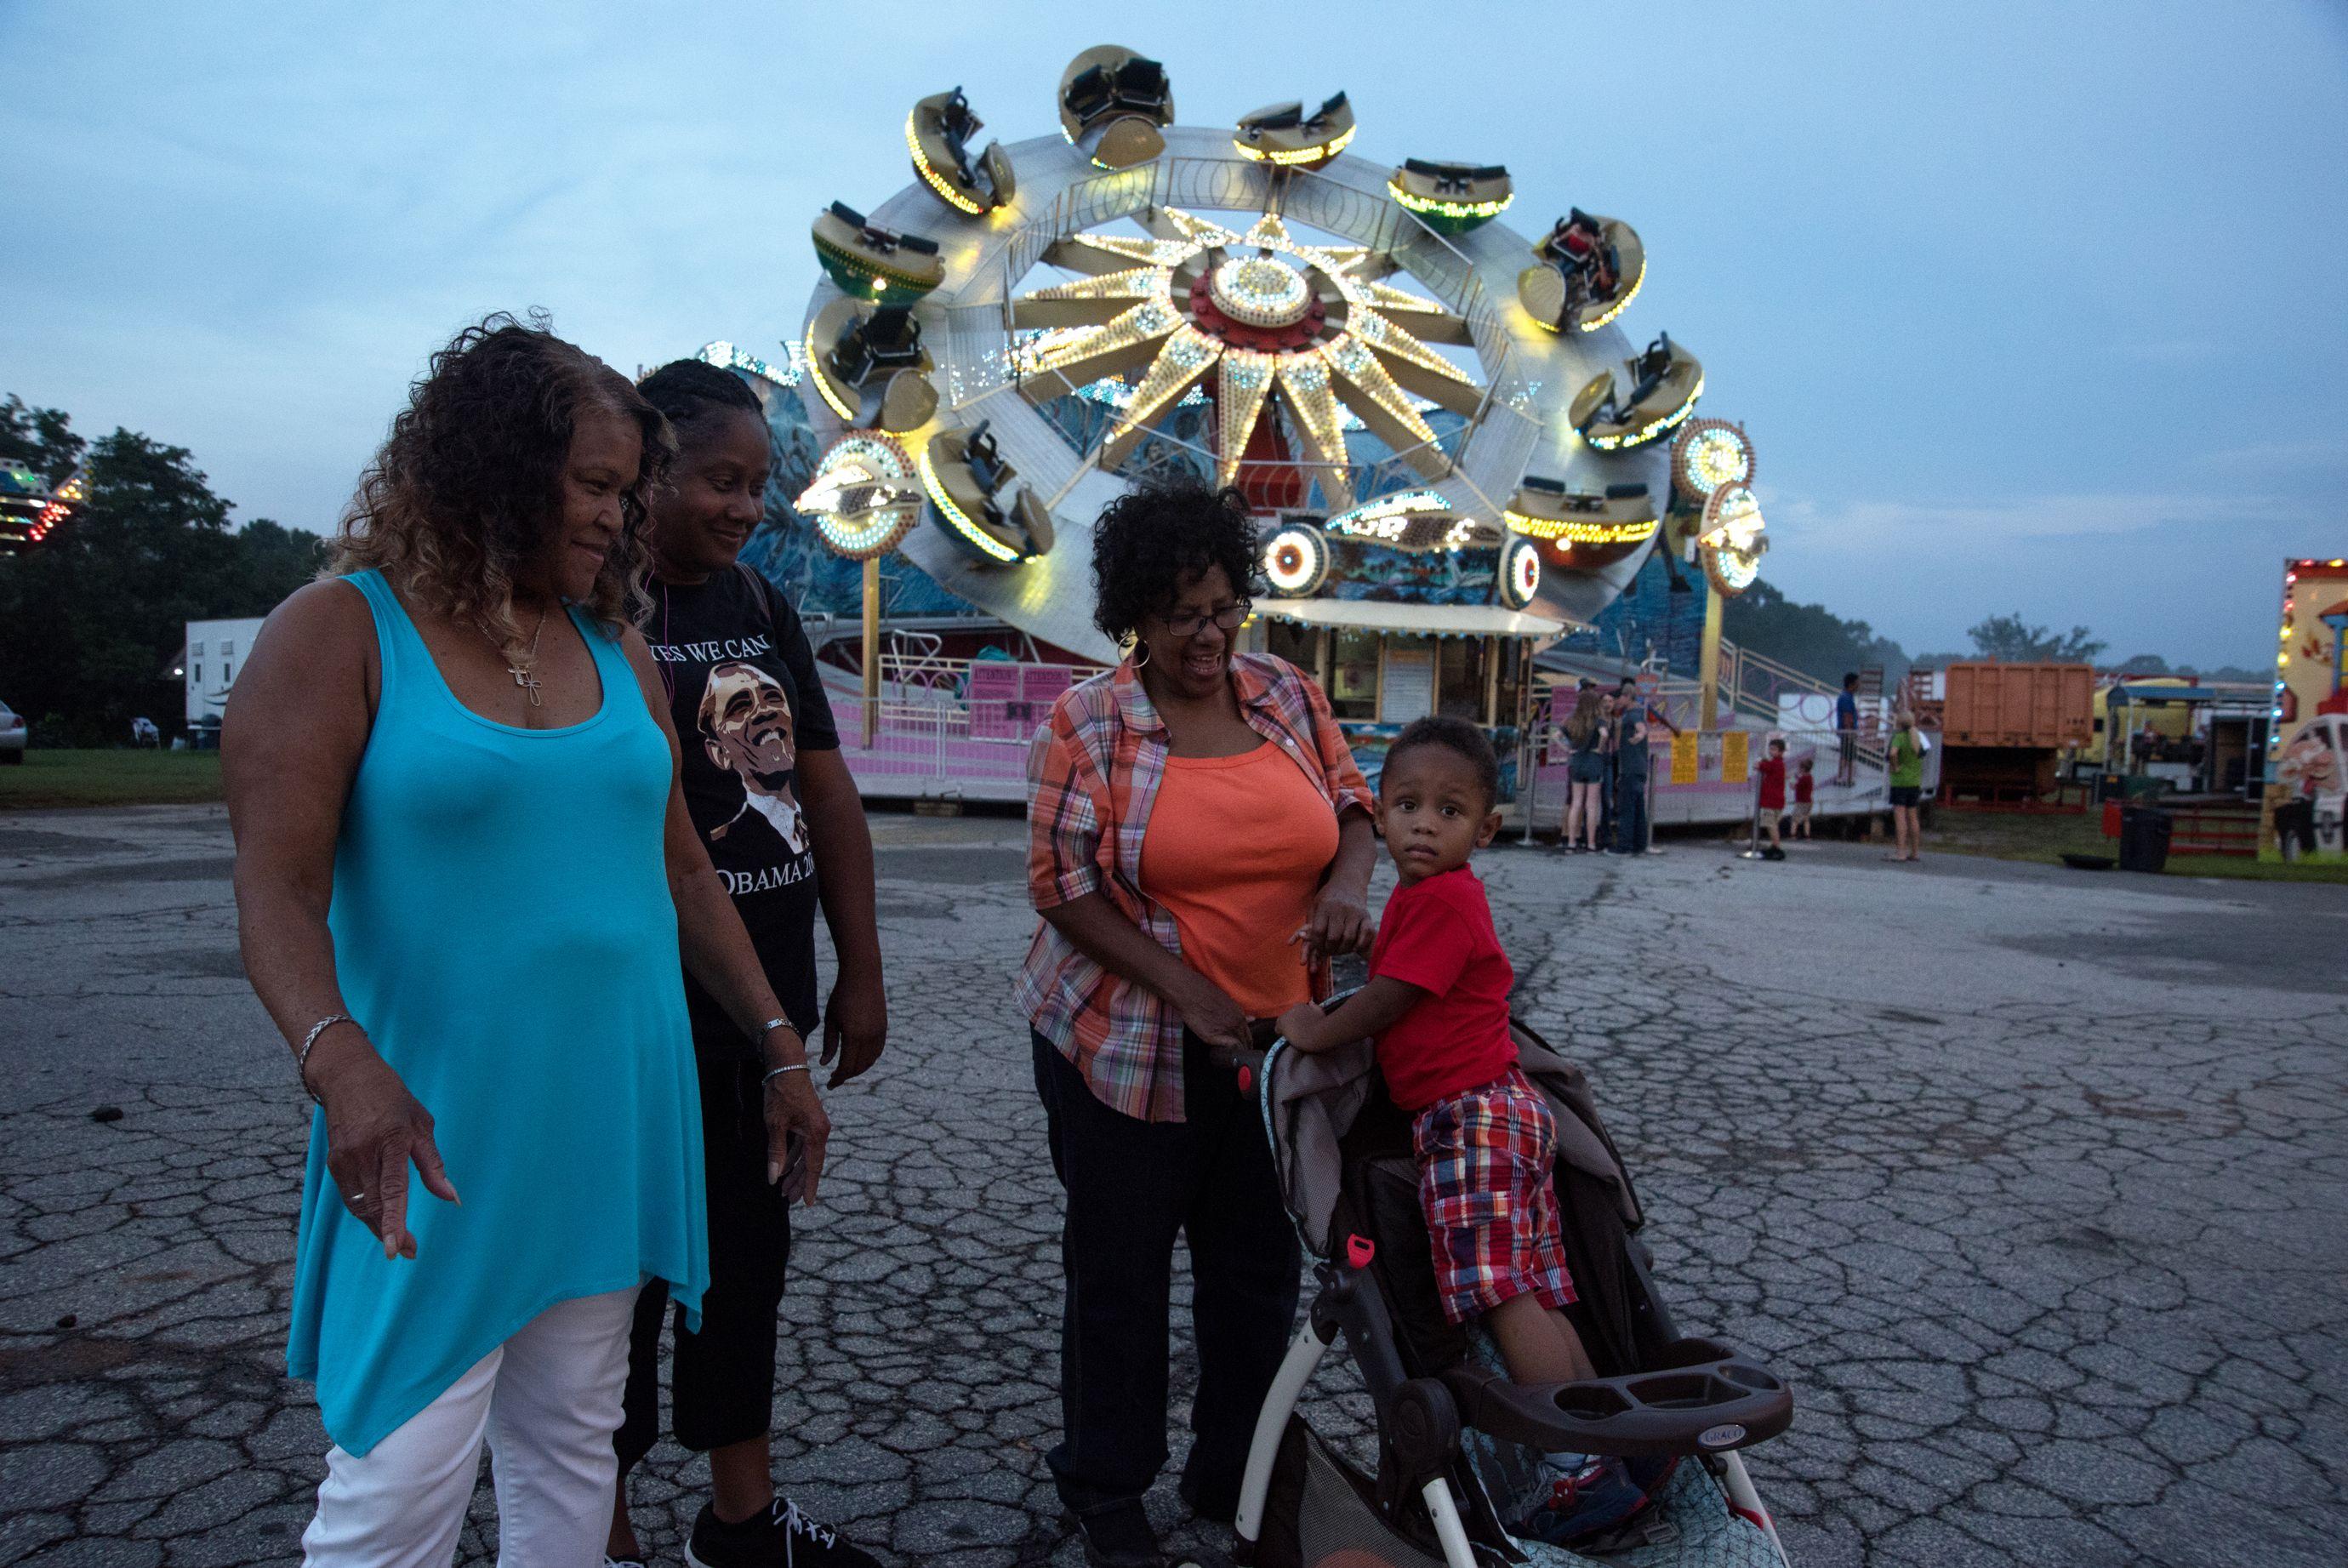 At the fair. (8 of 10)